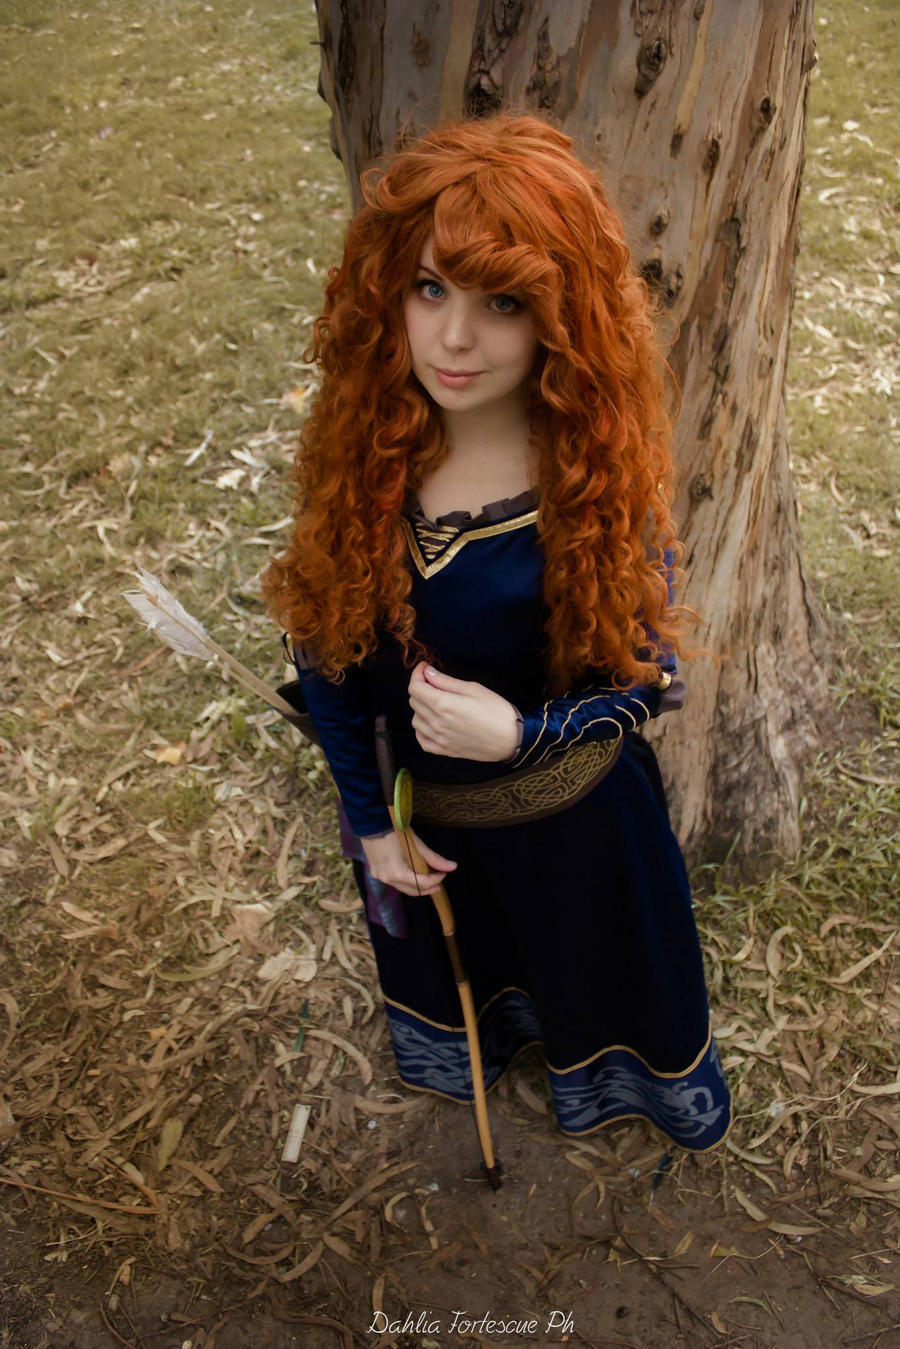 Merida Cosplay - Epilogue dress by Thecrystalshoe